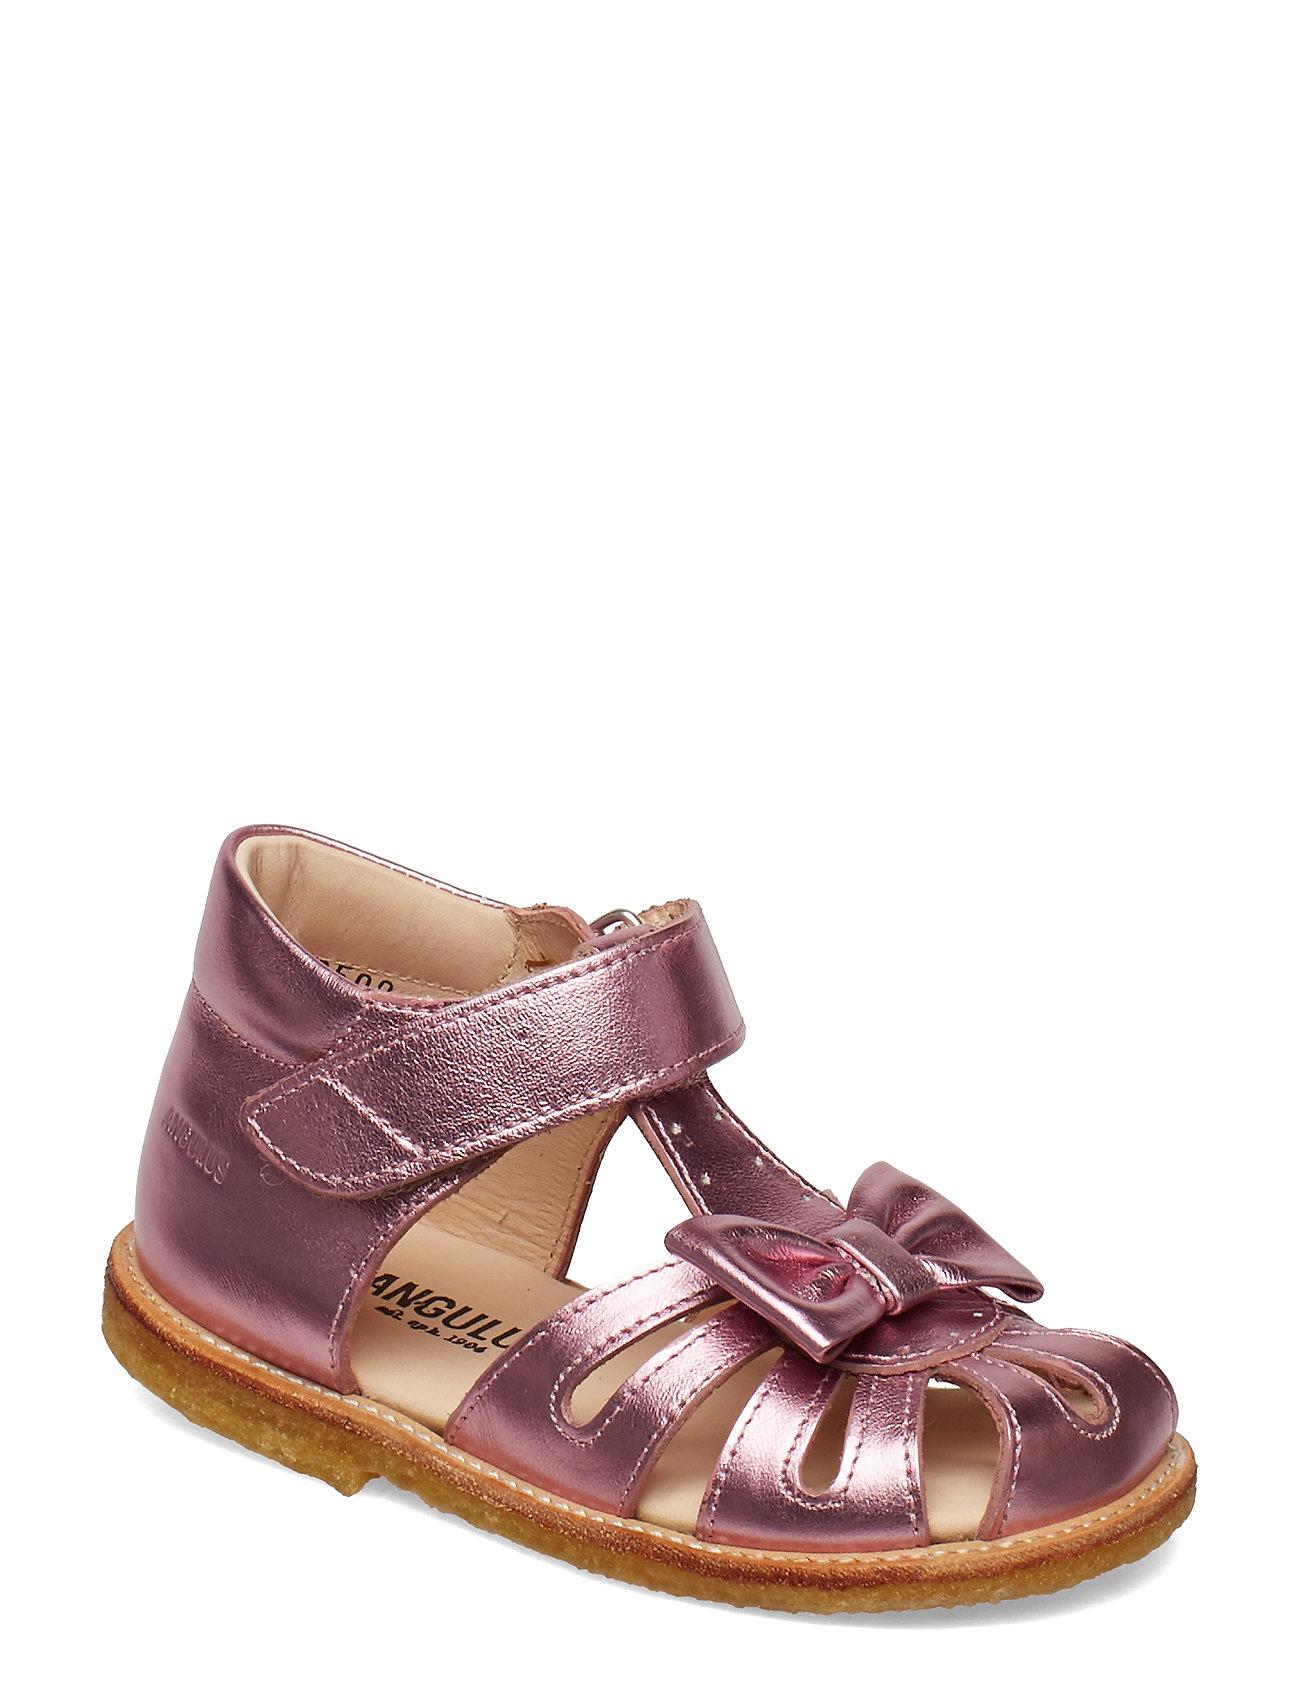 ANGULUS Sandals - flat - 1327 PINK SHINE